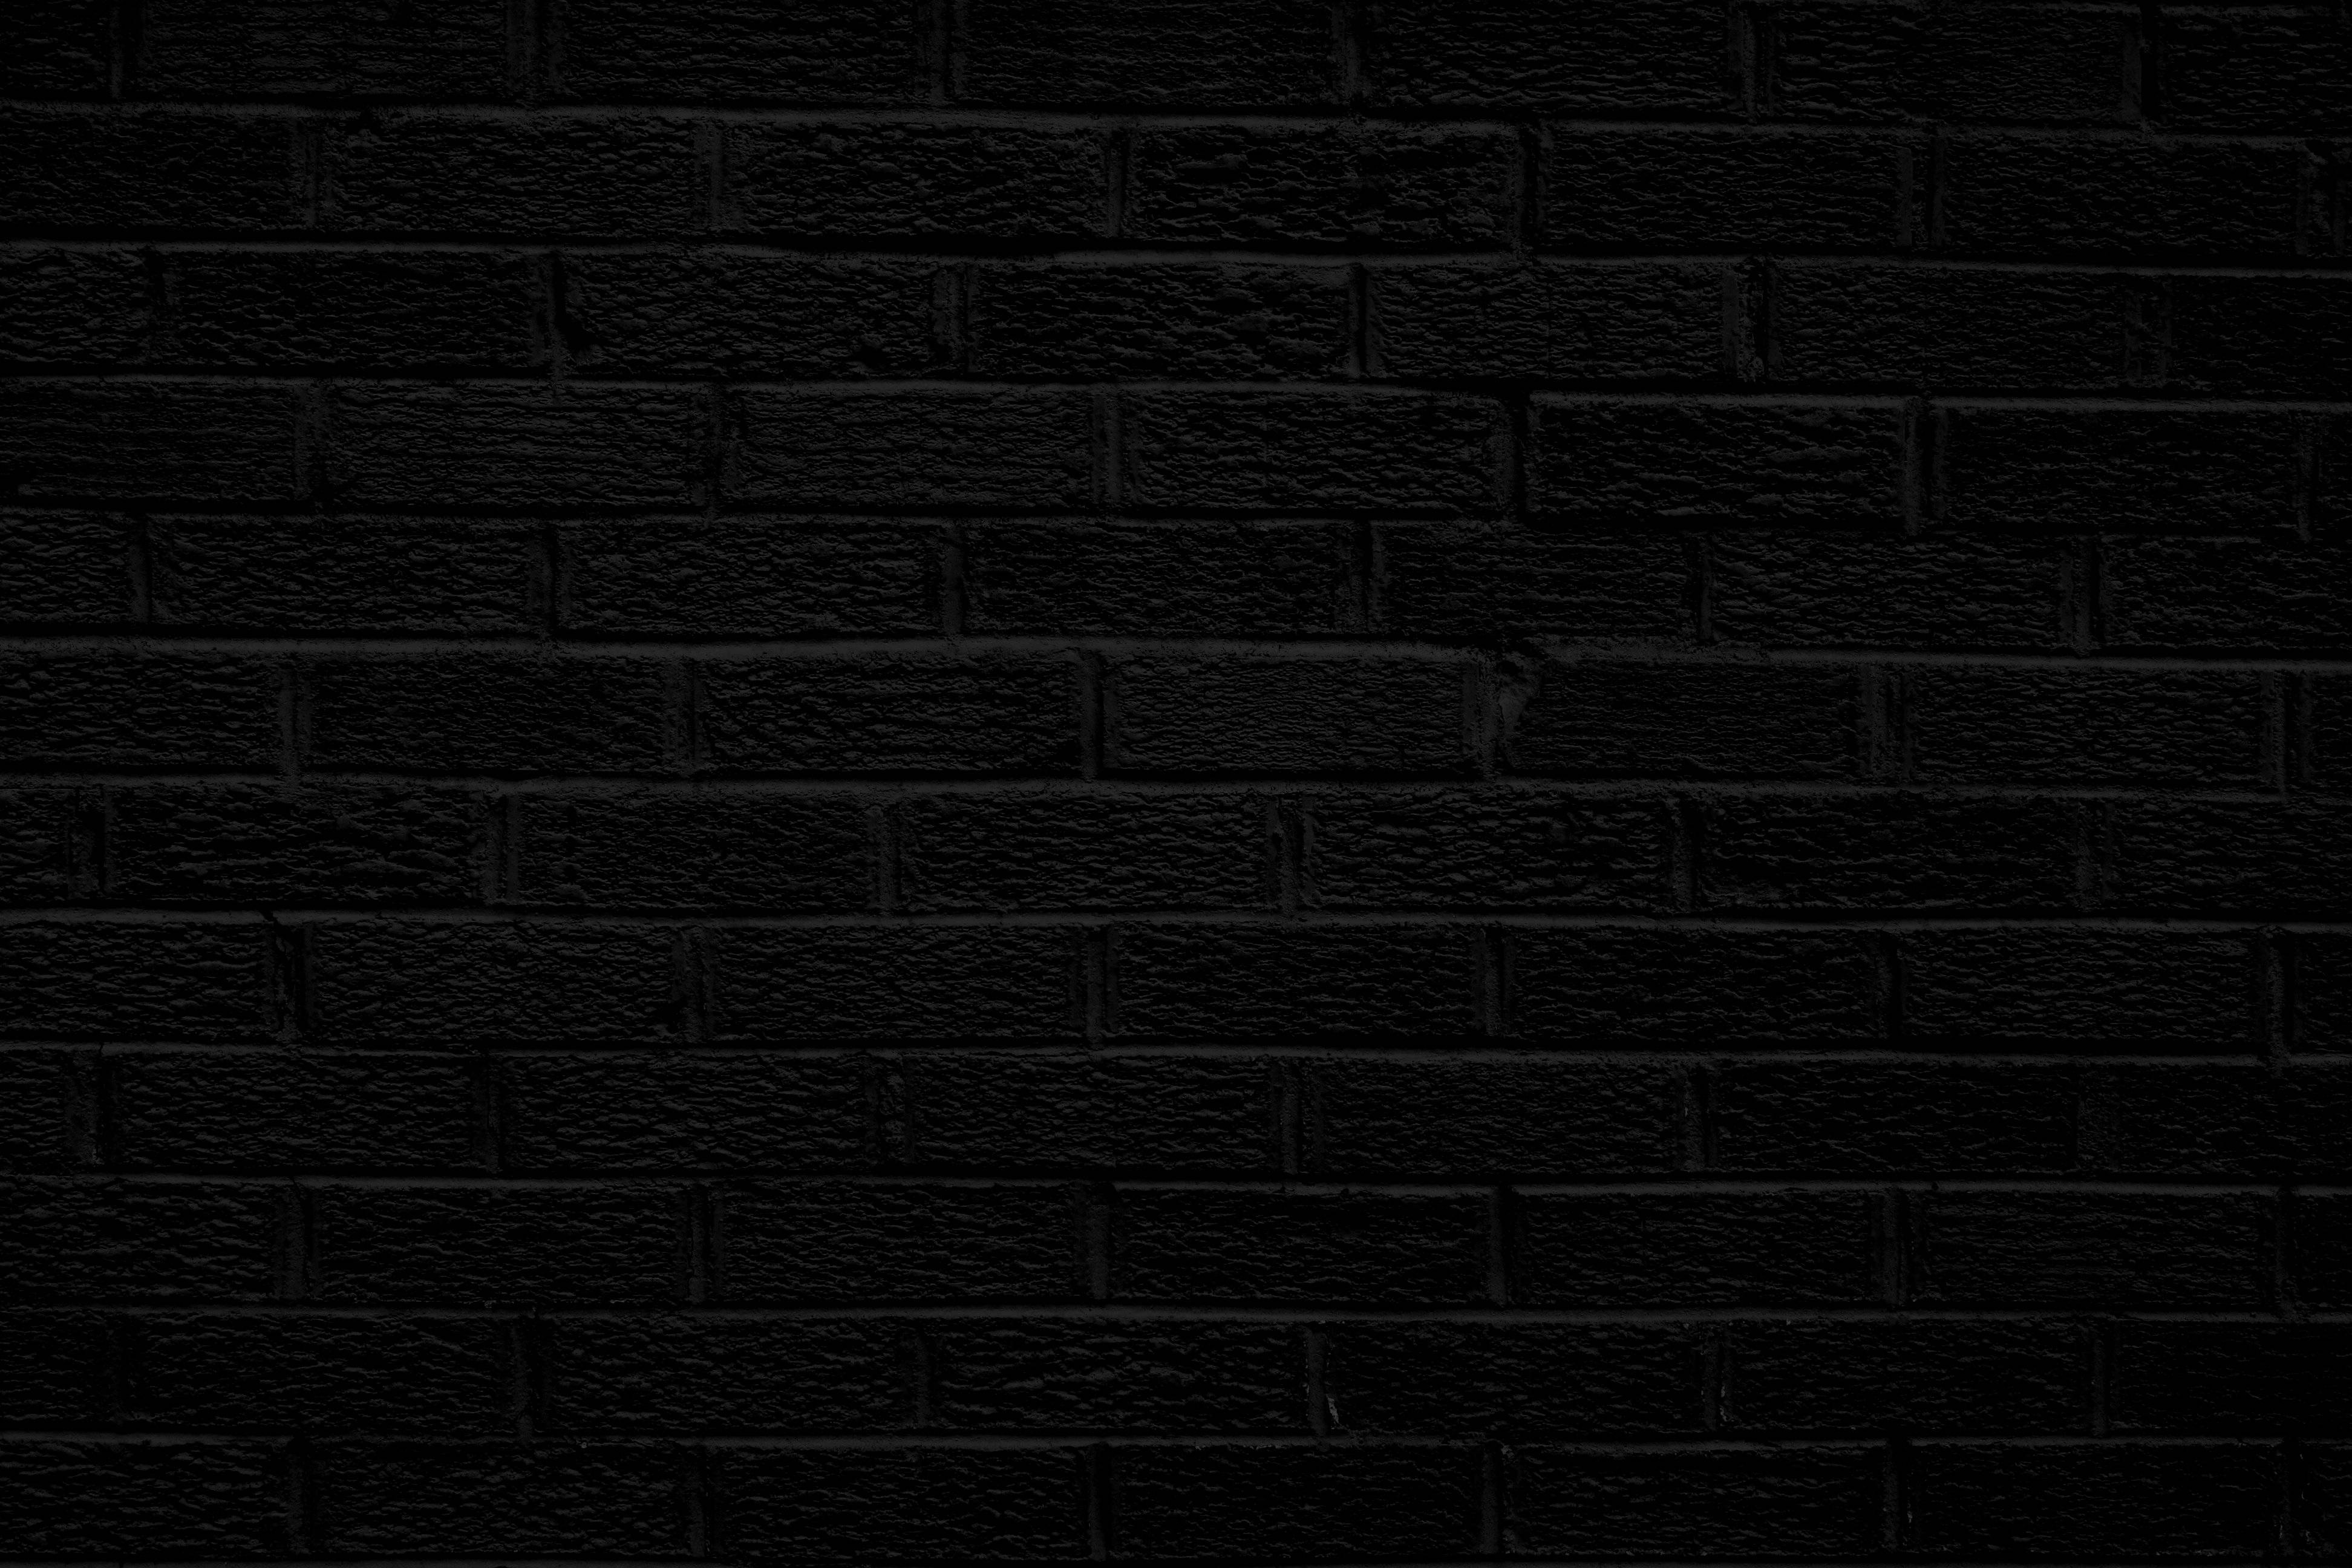 black wall texture. Download Black Brick Wall Texture Picture Free Graph Public Design . X